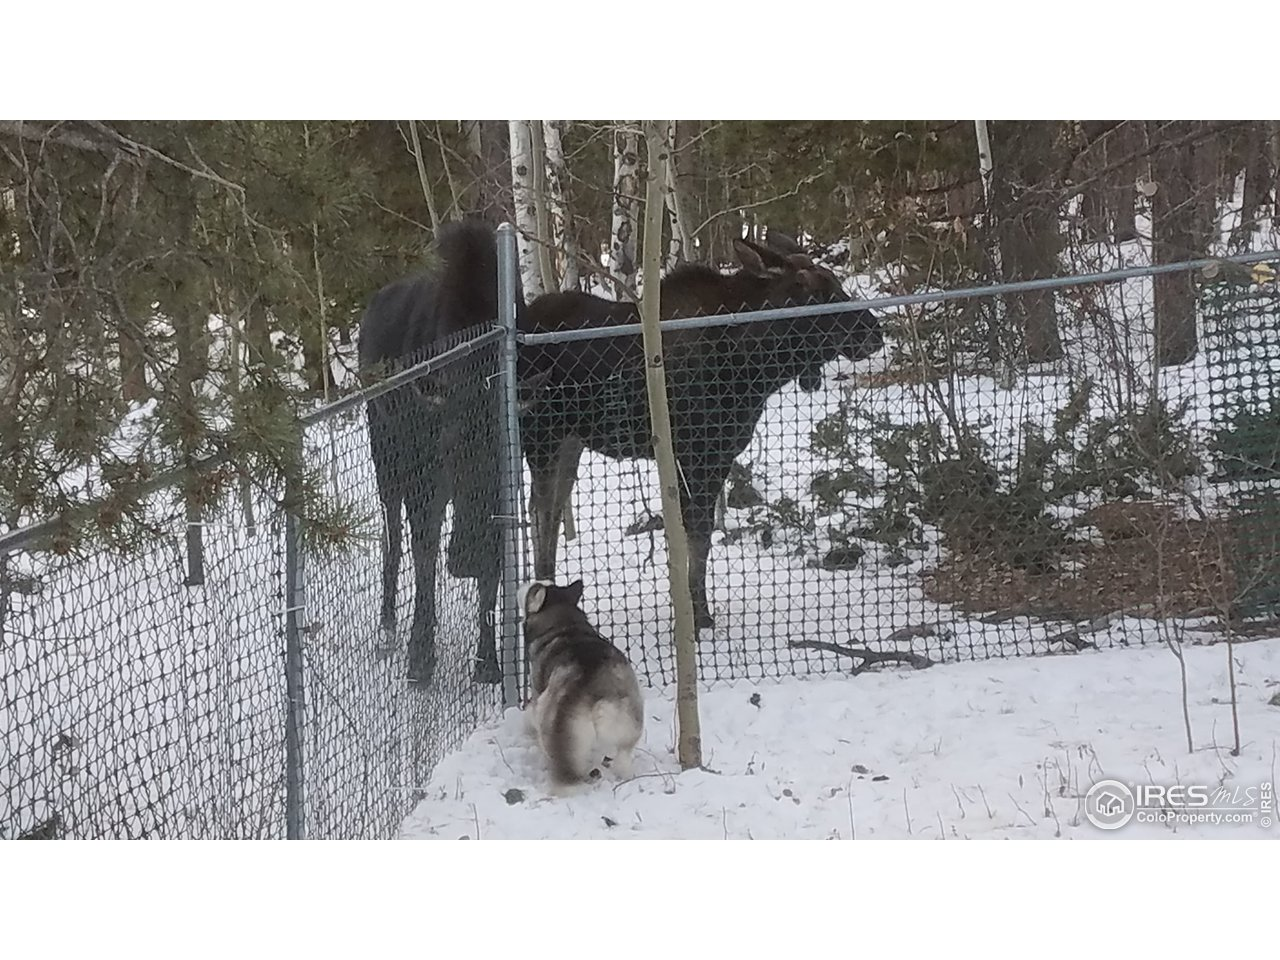 Moose/deer/elk frequent the property